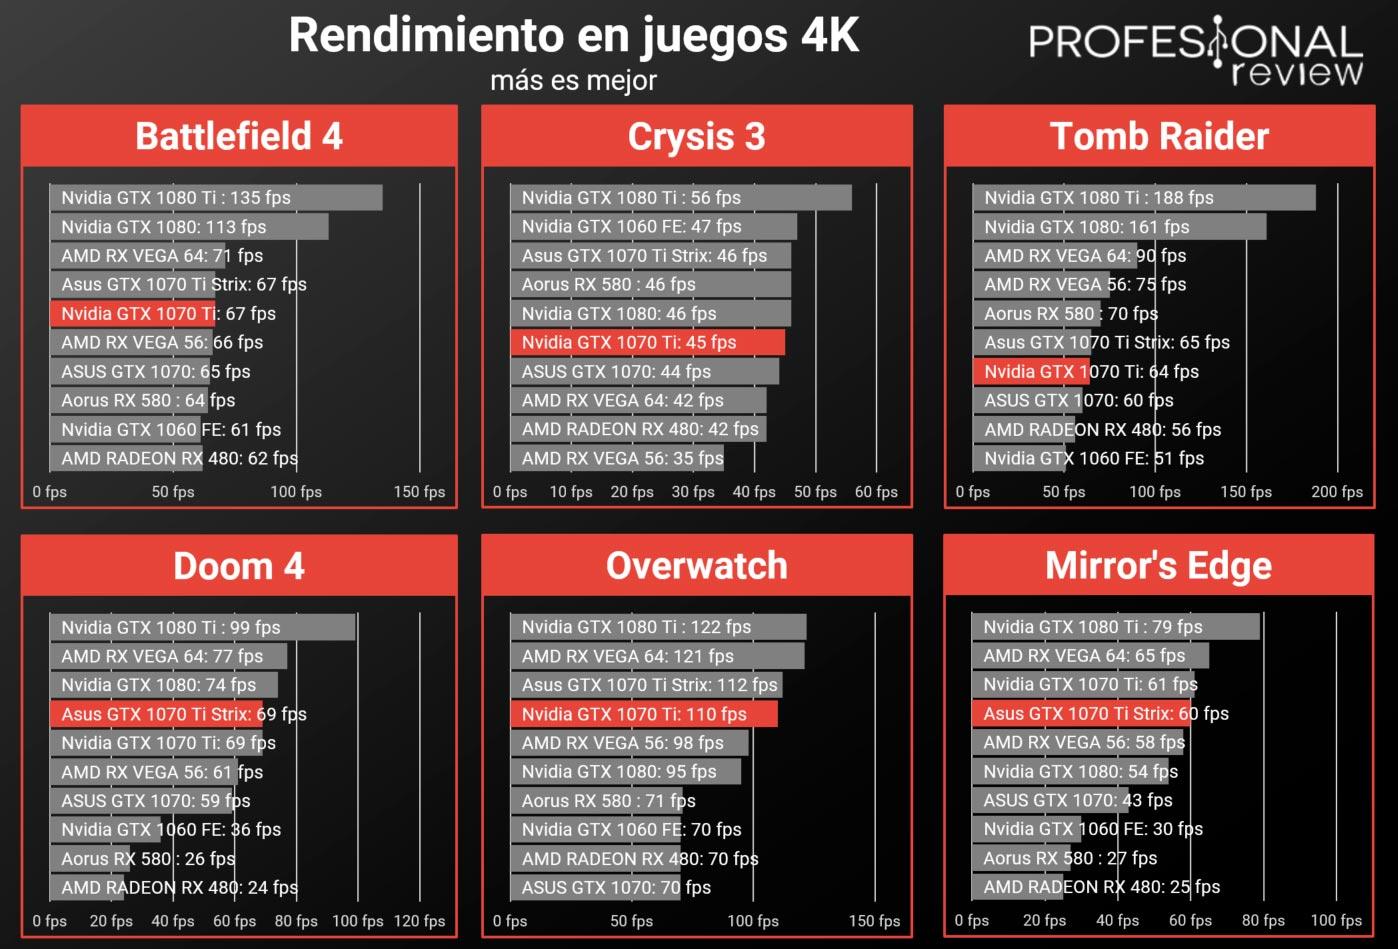 Asus GTX 1070 Ti STRIX Review en Español (Análisis completo)